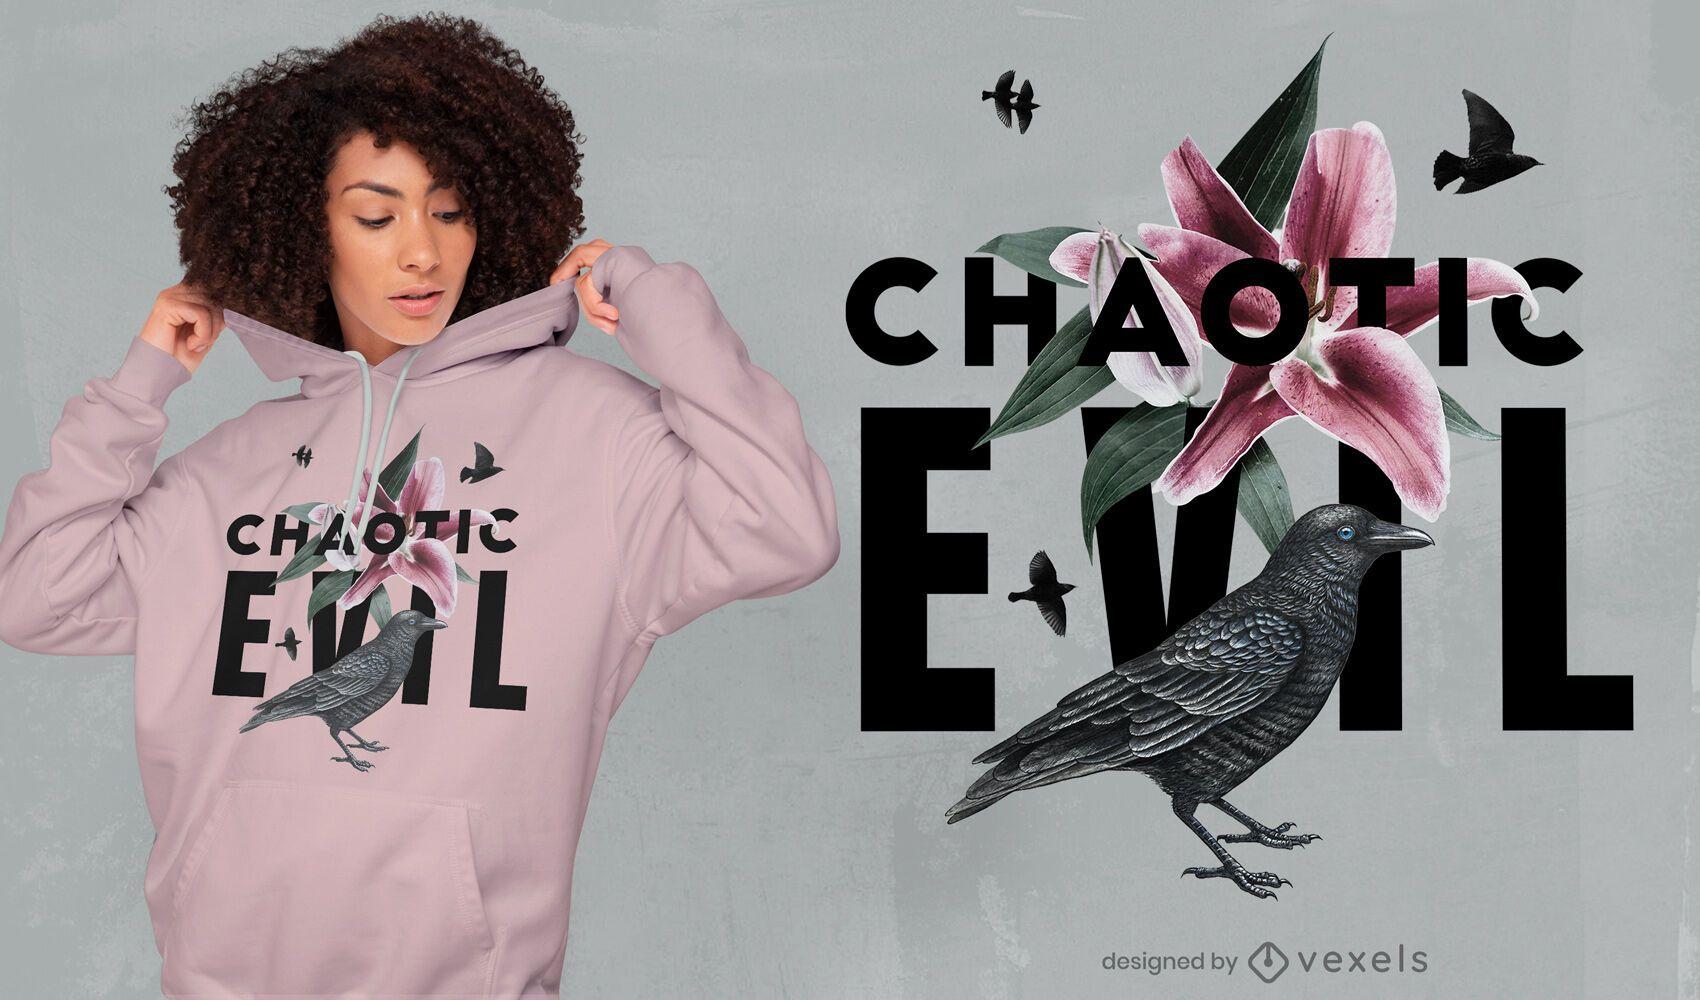 Diseño de camiseta psd malvado caótico floral